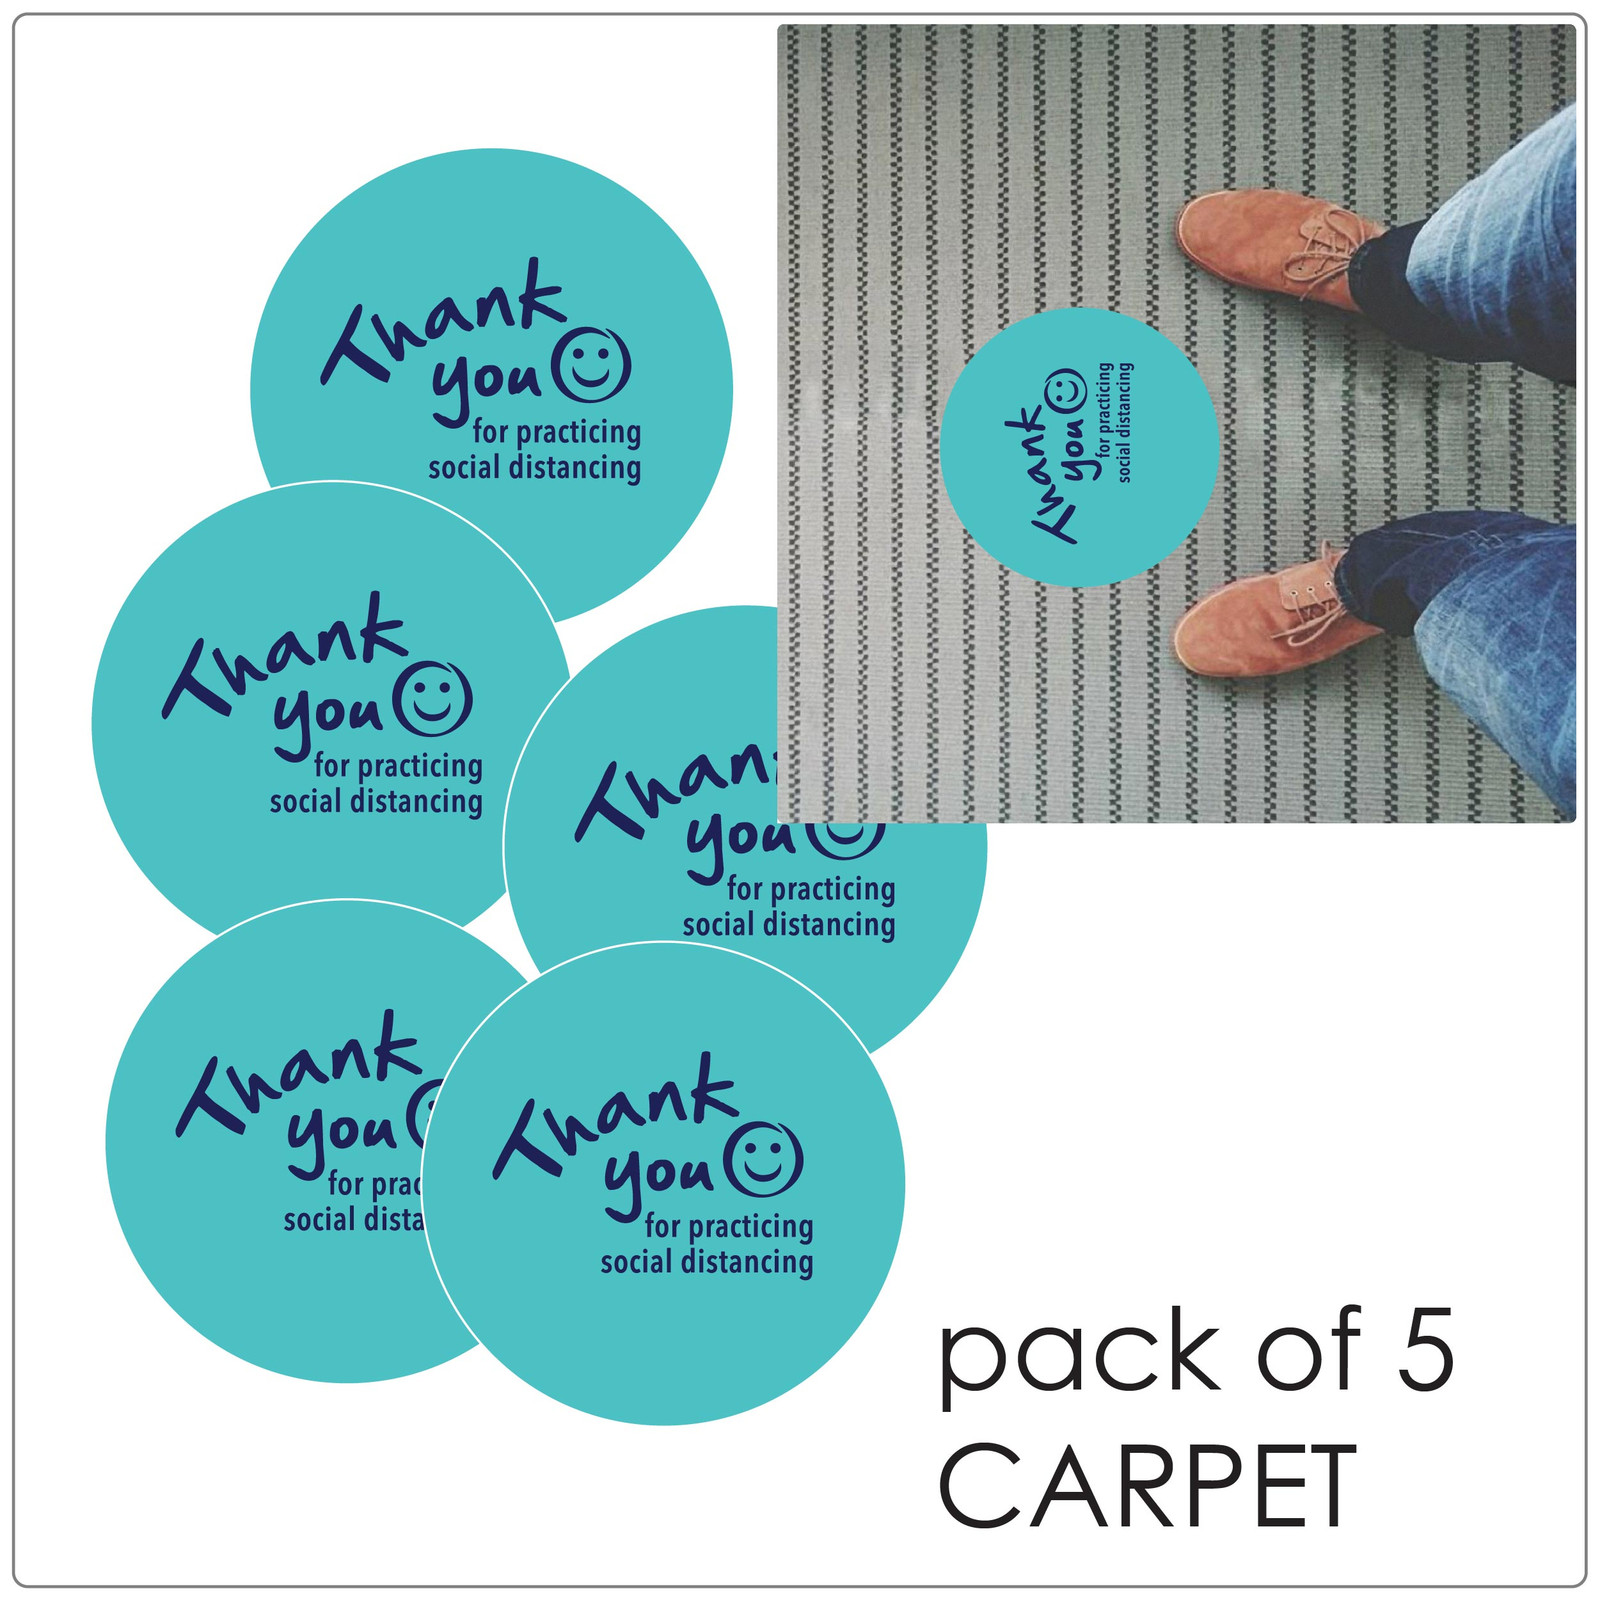 social distancing floor marker for carpet, pack of 5, teal Self-adhesive Corona virus floor marker to help social distancing